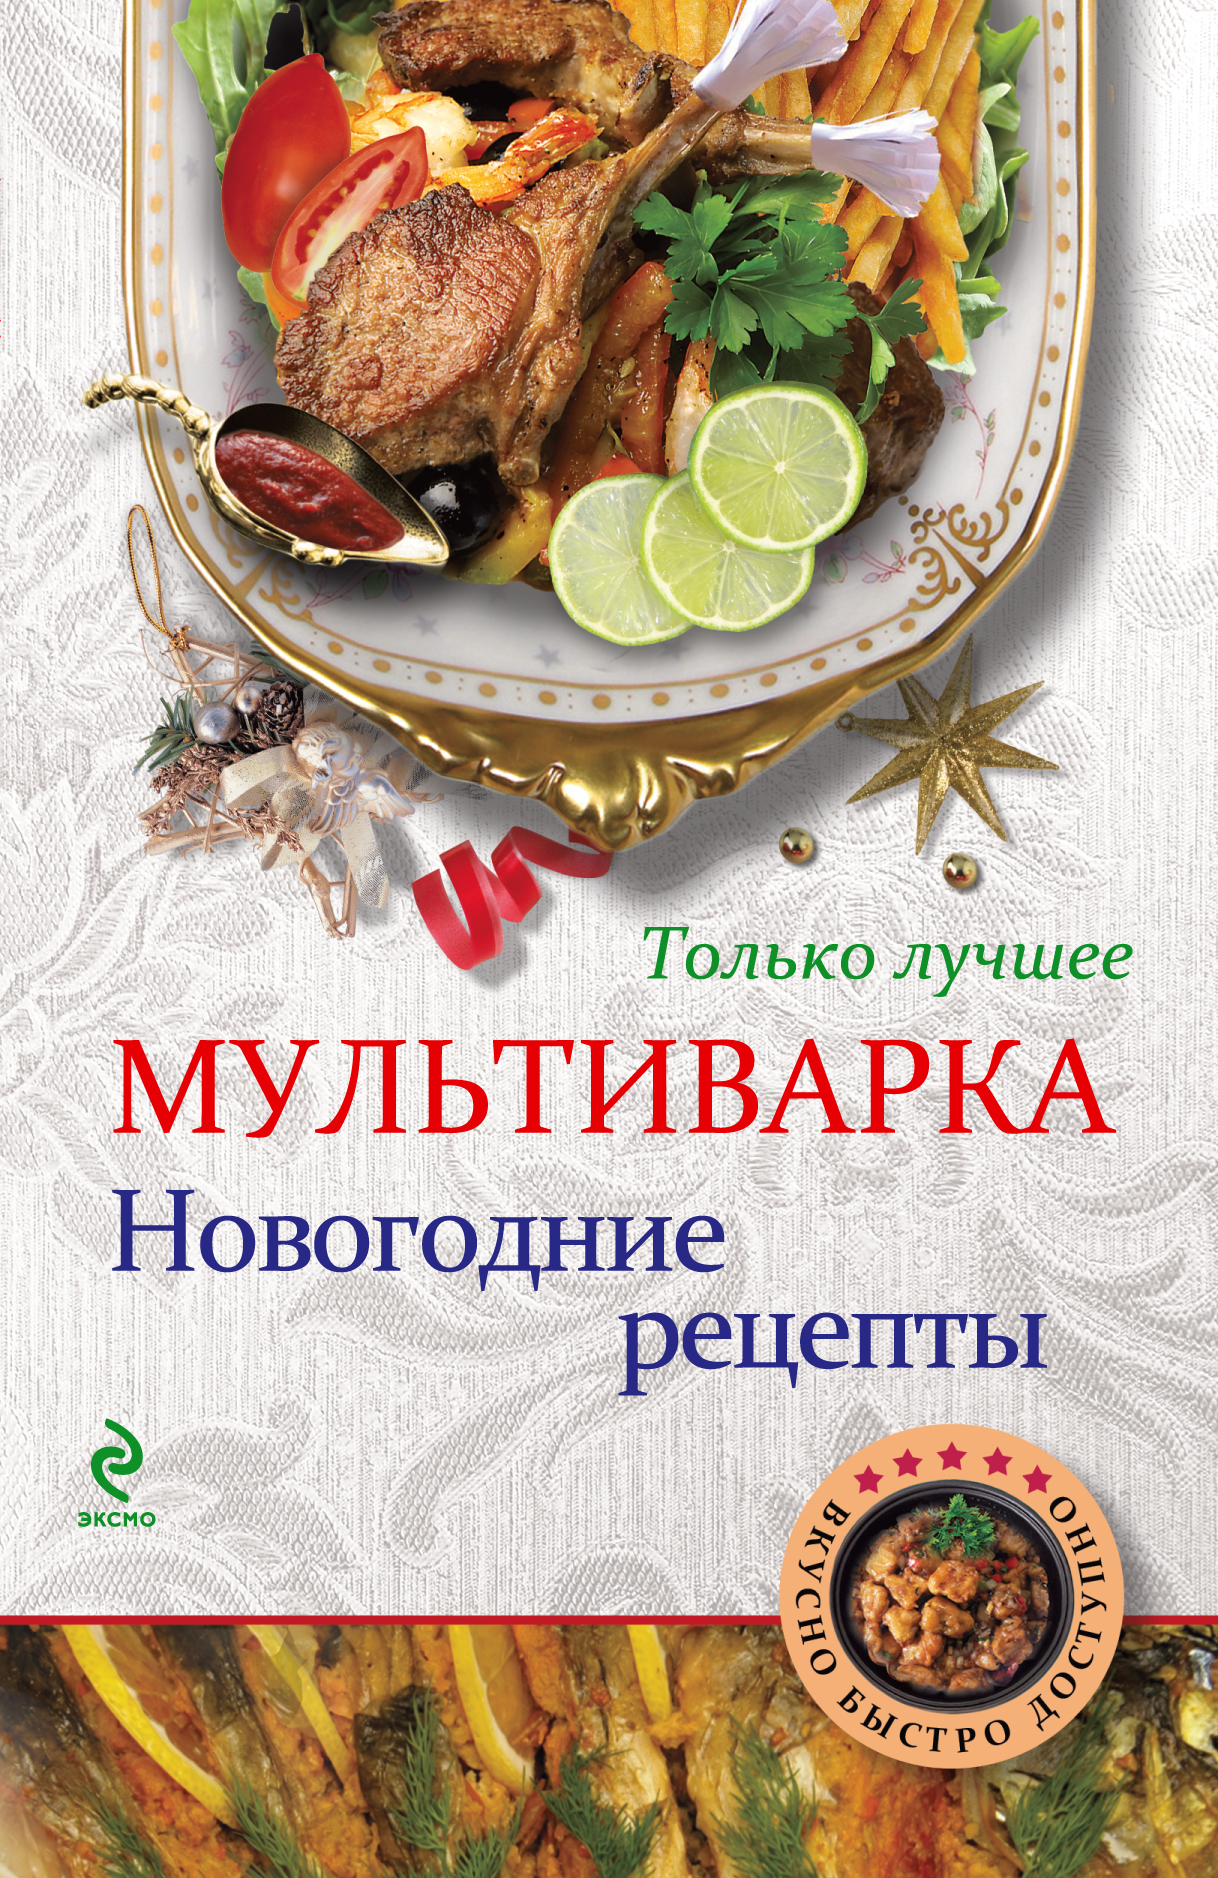 Мультиварка. Новогодние рецепты (ВБД)